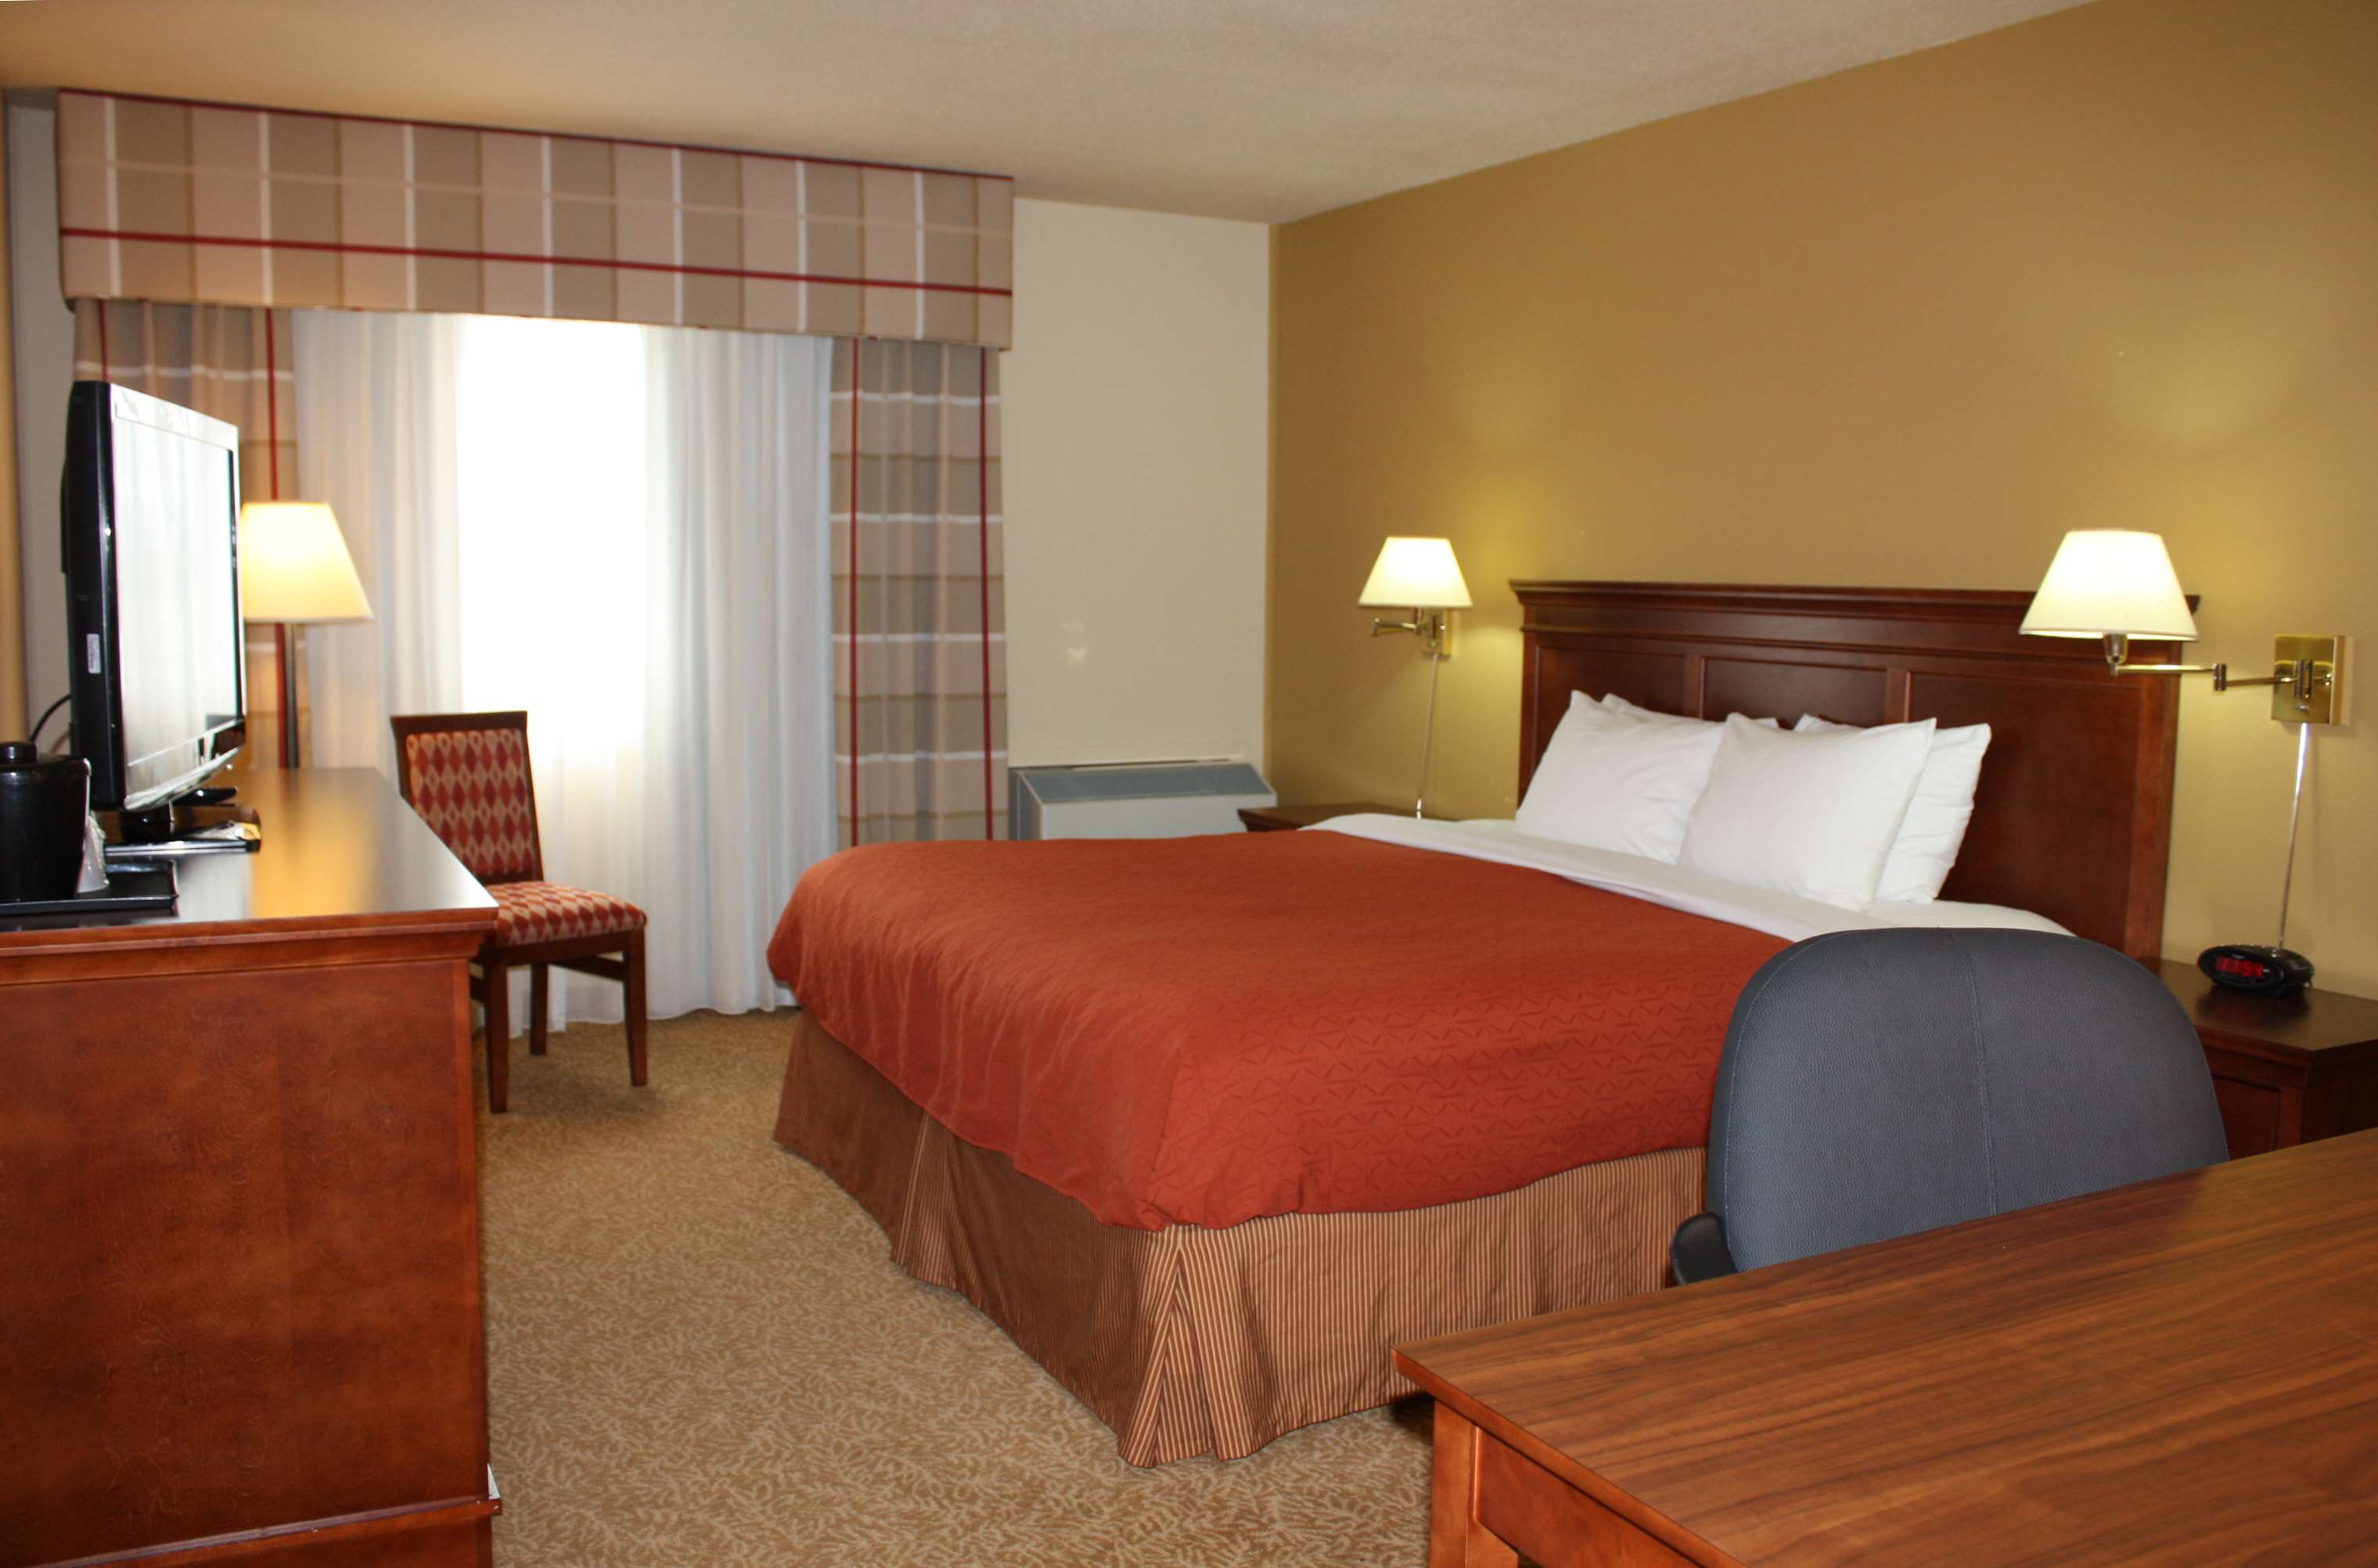 Country Inn & Suites by Radisson, Regina, SK in Regina: King Bed